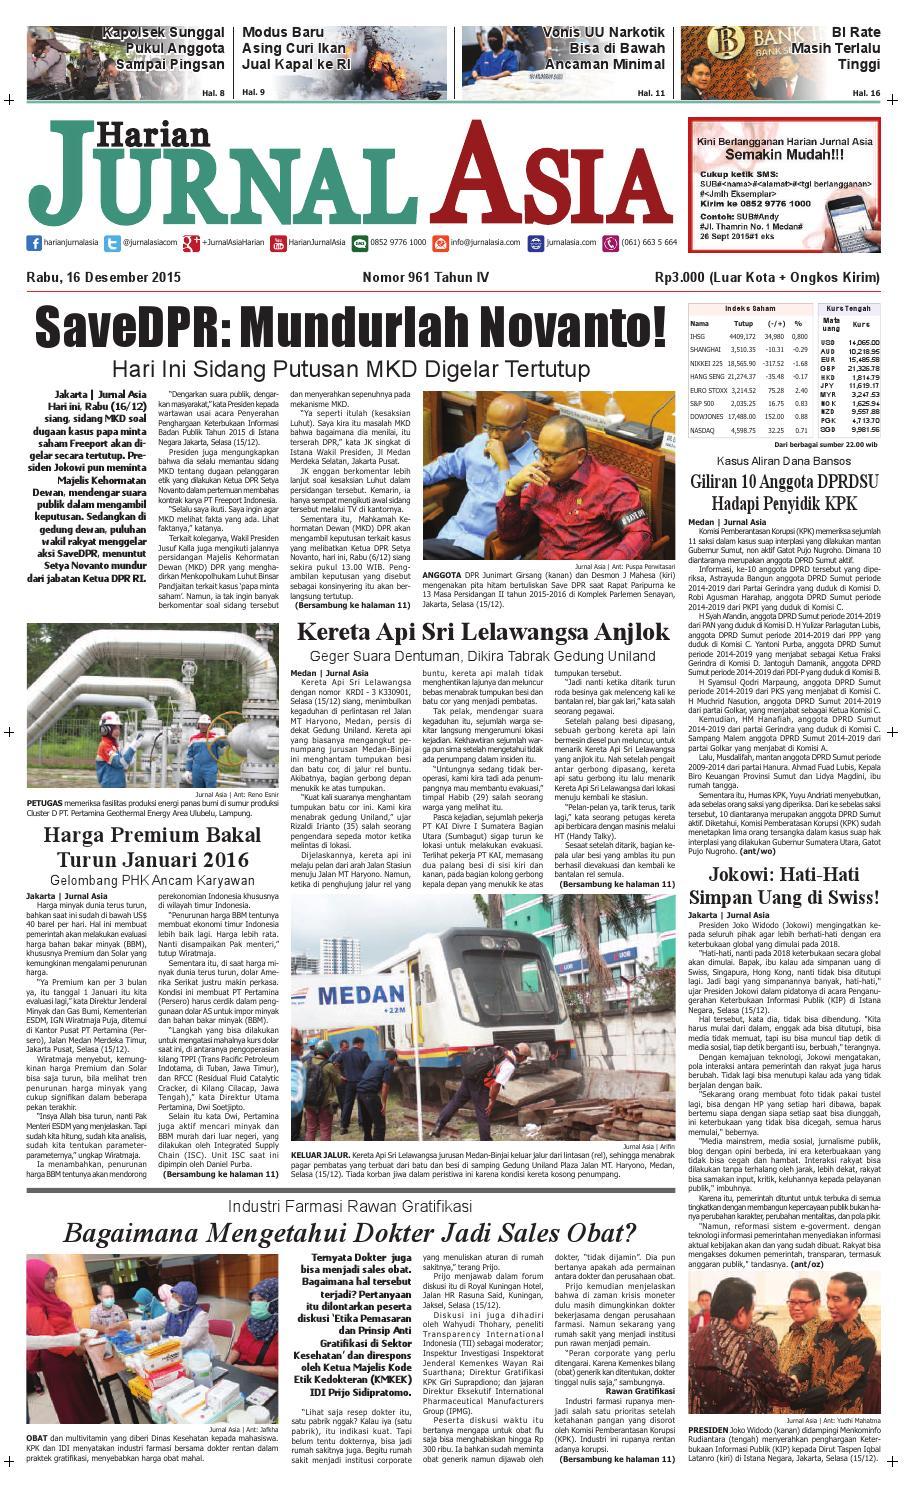 Harian Jurnal Asia Edisi Rabu, 16 Desember 2015 by Harian Jurnal Asia - Medan - issuu